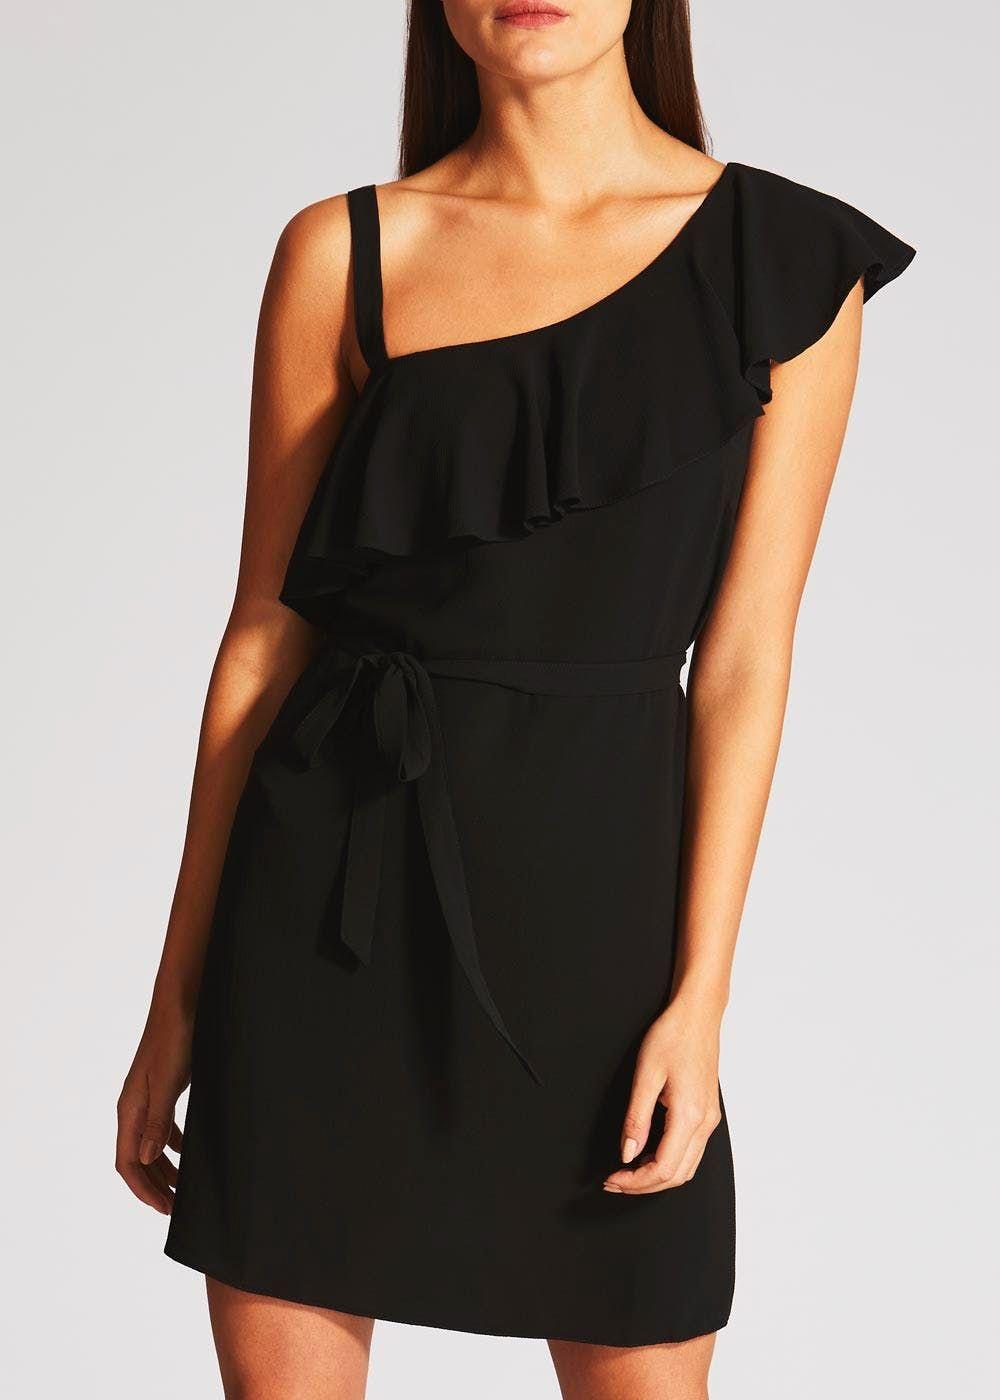 9dd3a13fb7080 Matalan Womens Holiday Dresses